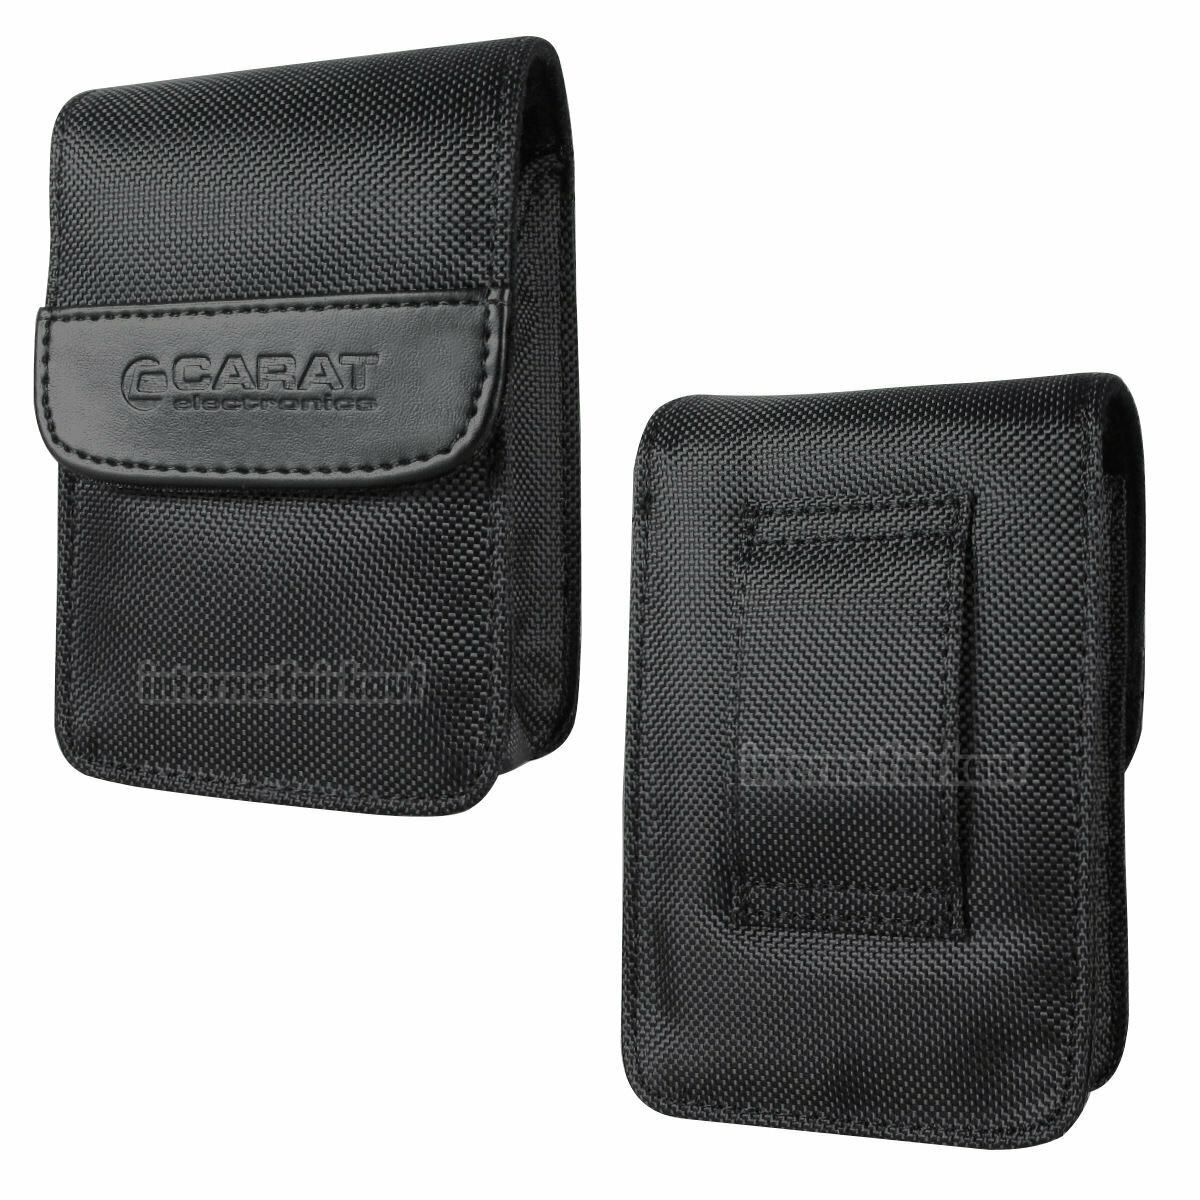 Kameratasche passend für Panasonic Lumix DMC-TZ41 TZ36 TZ31 - Etui